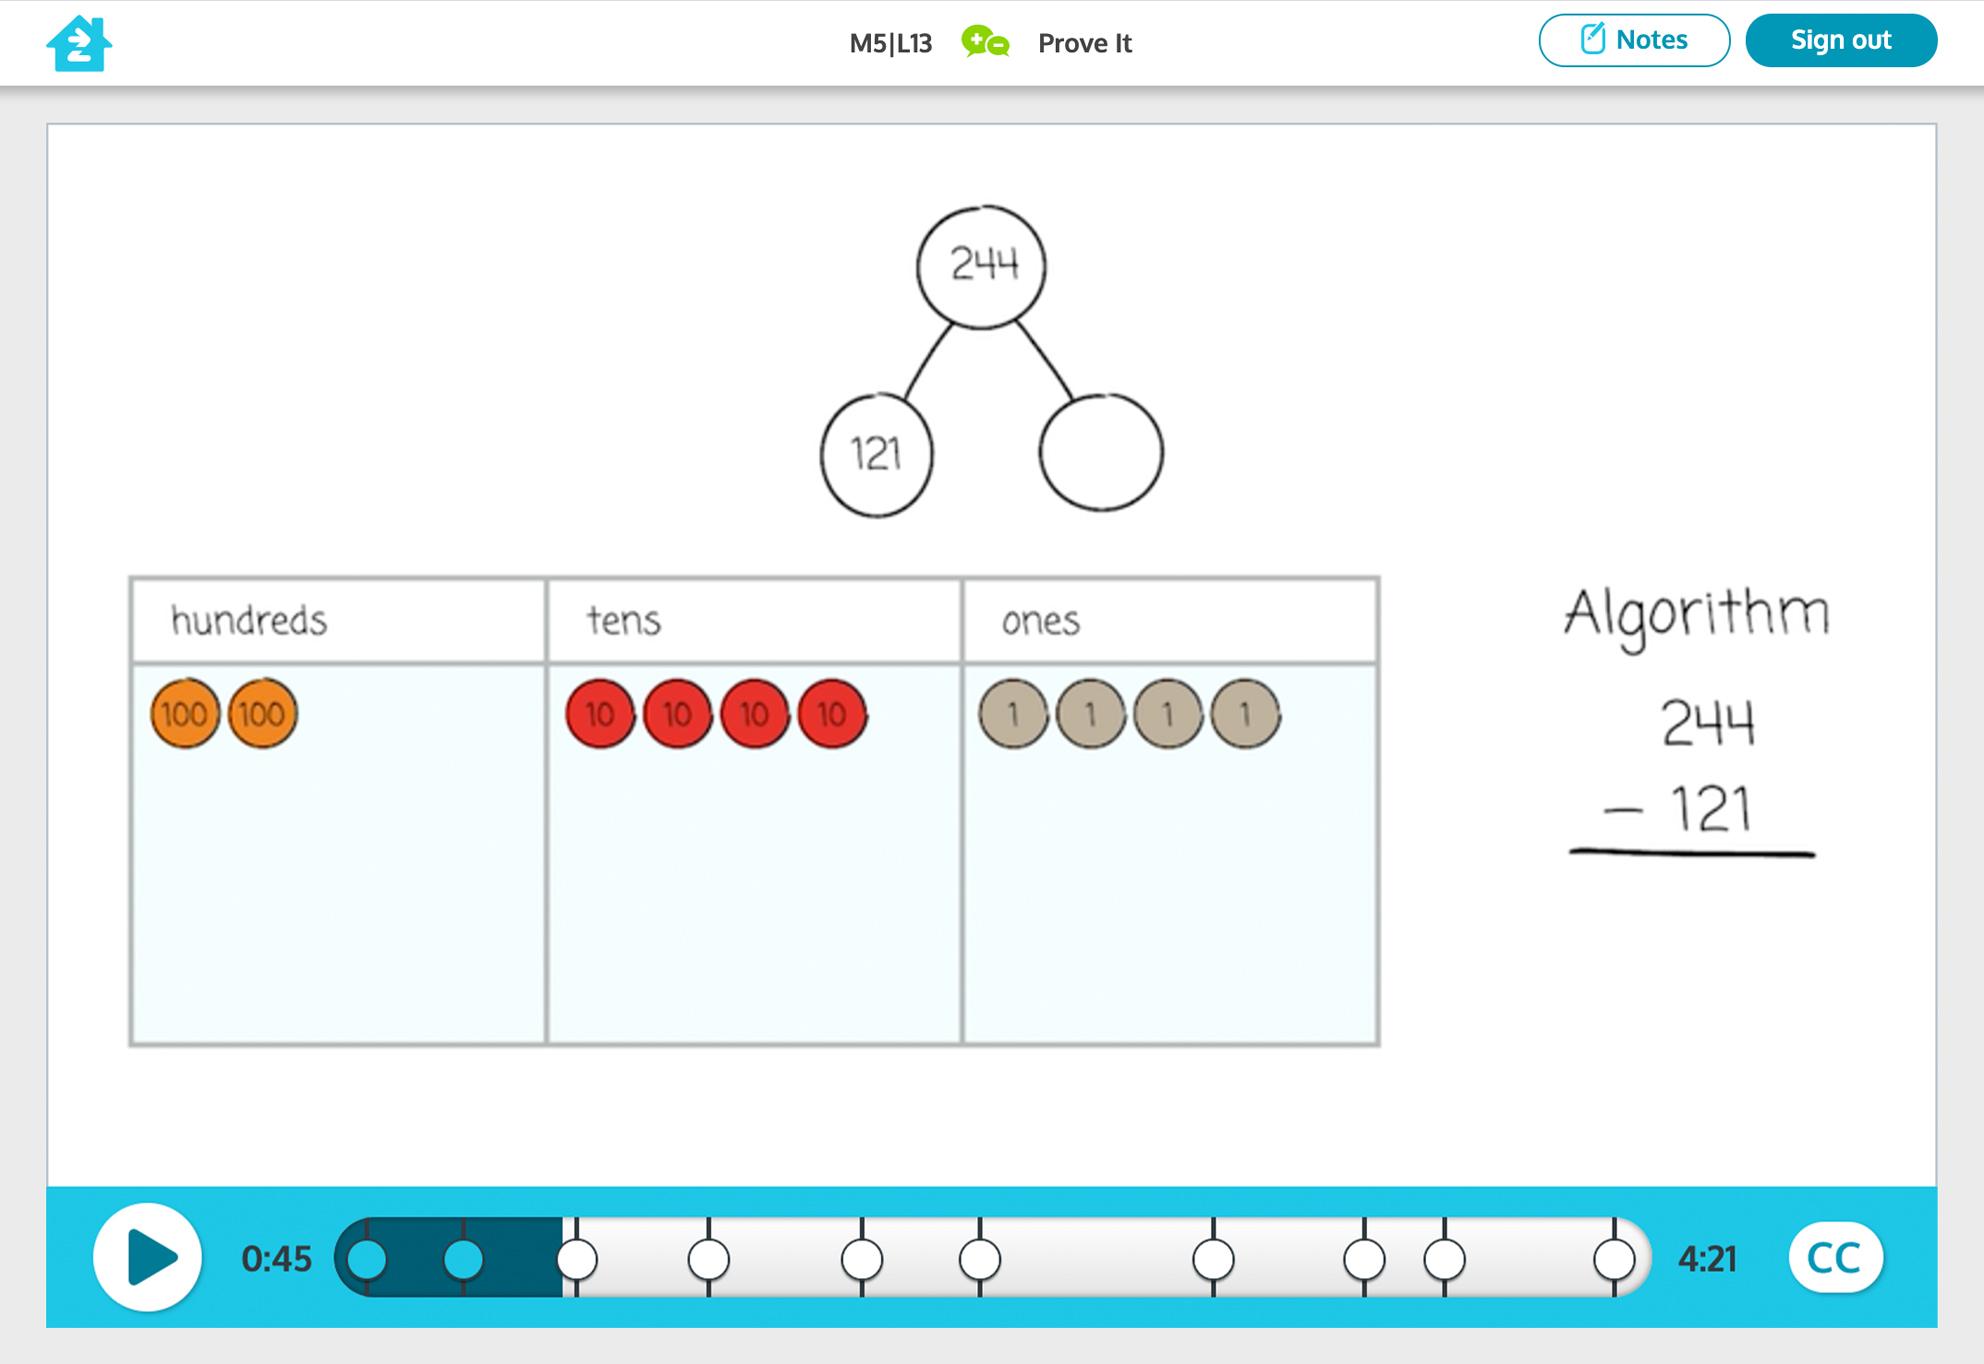 Grade 2 math activity, preview image